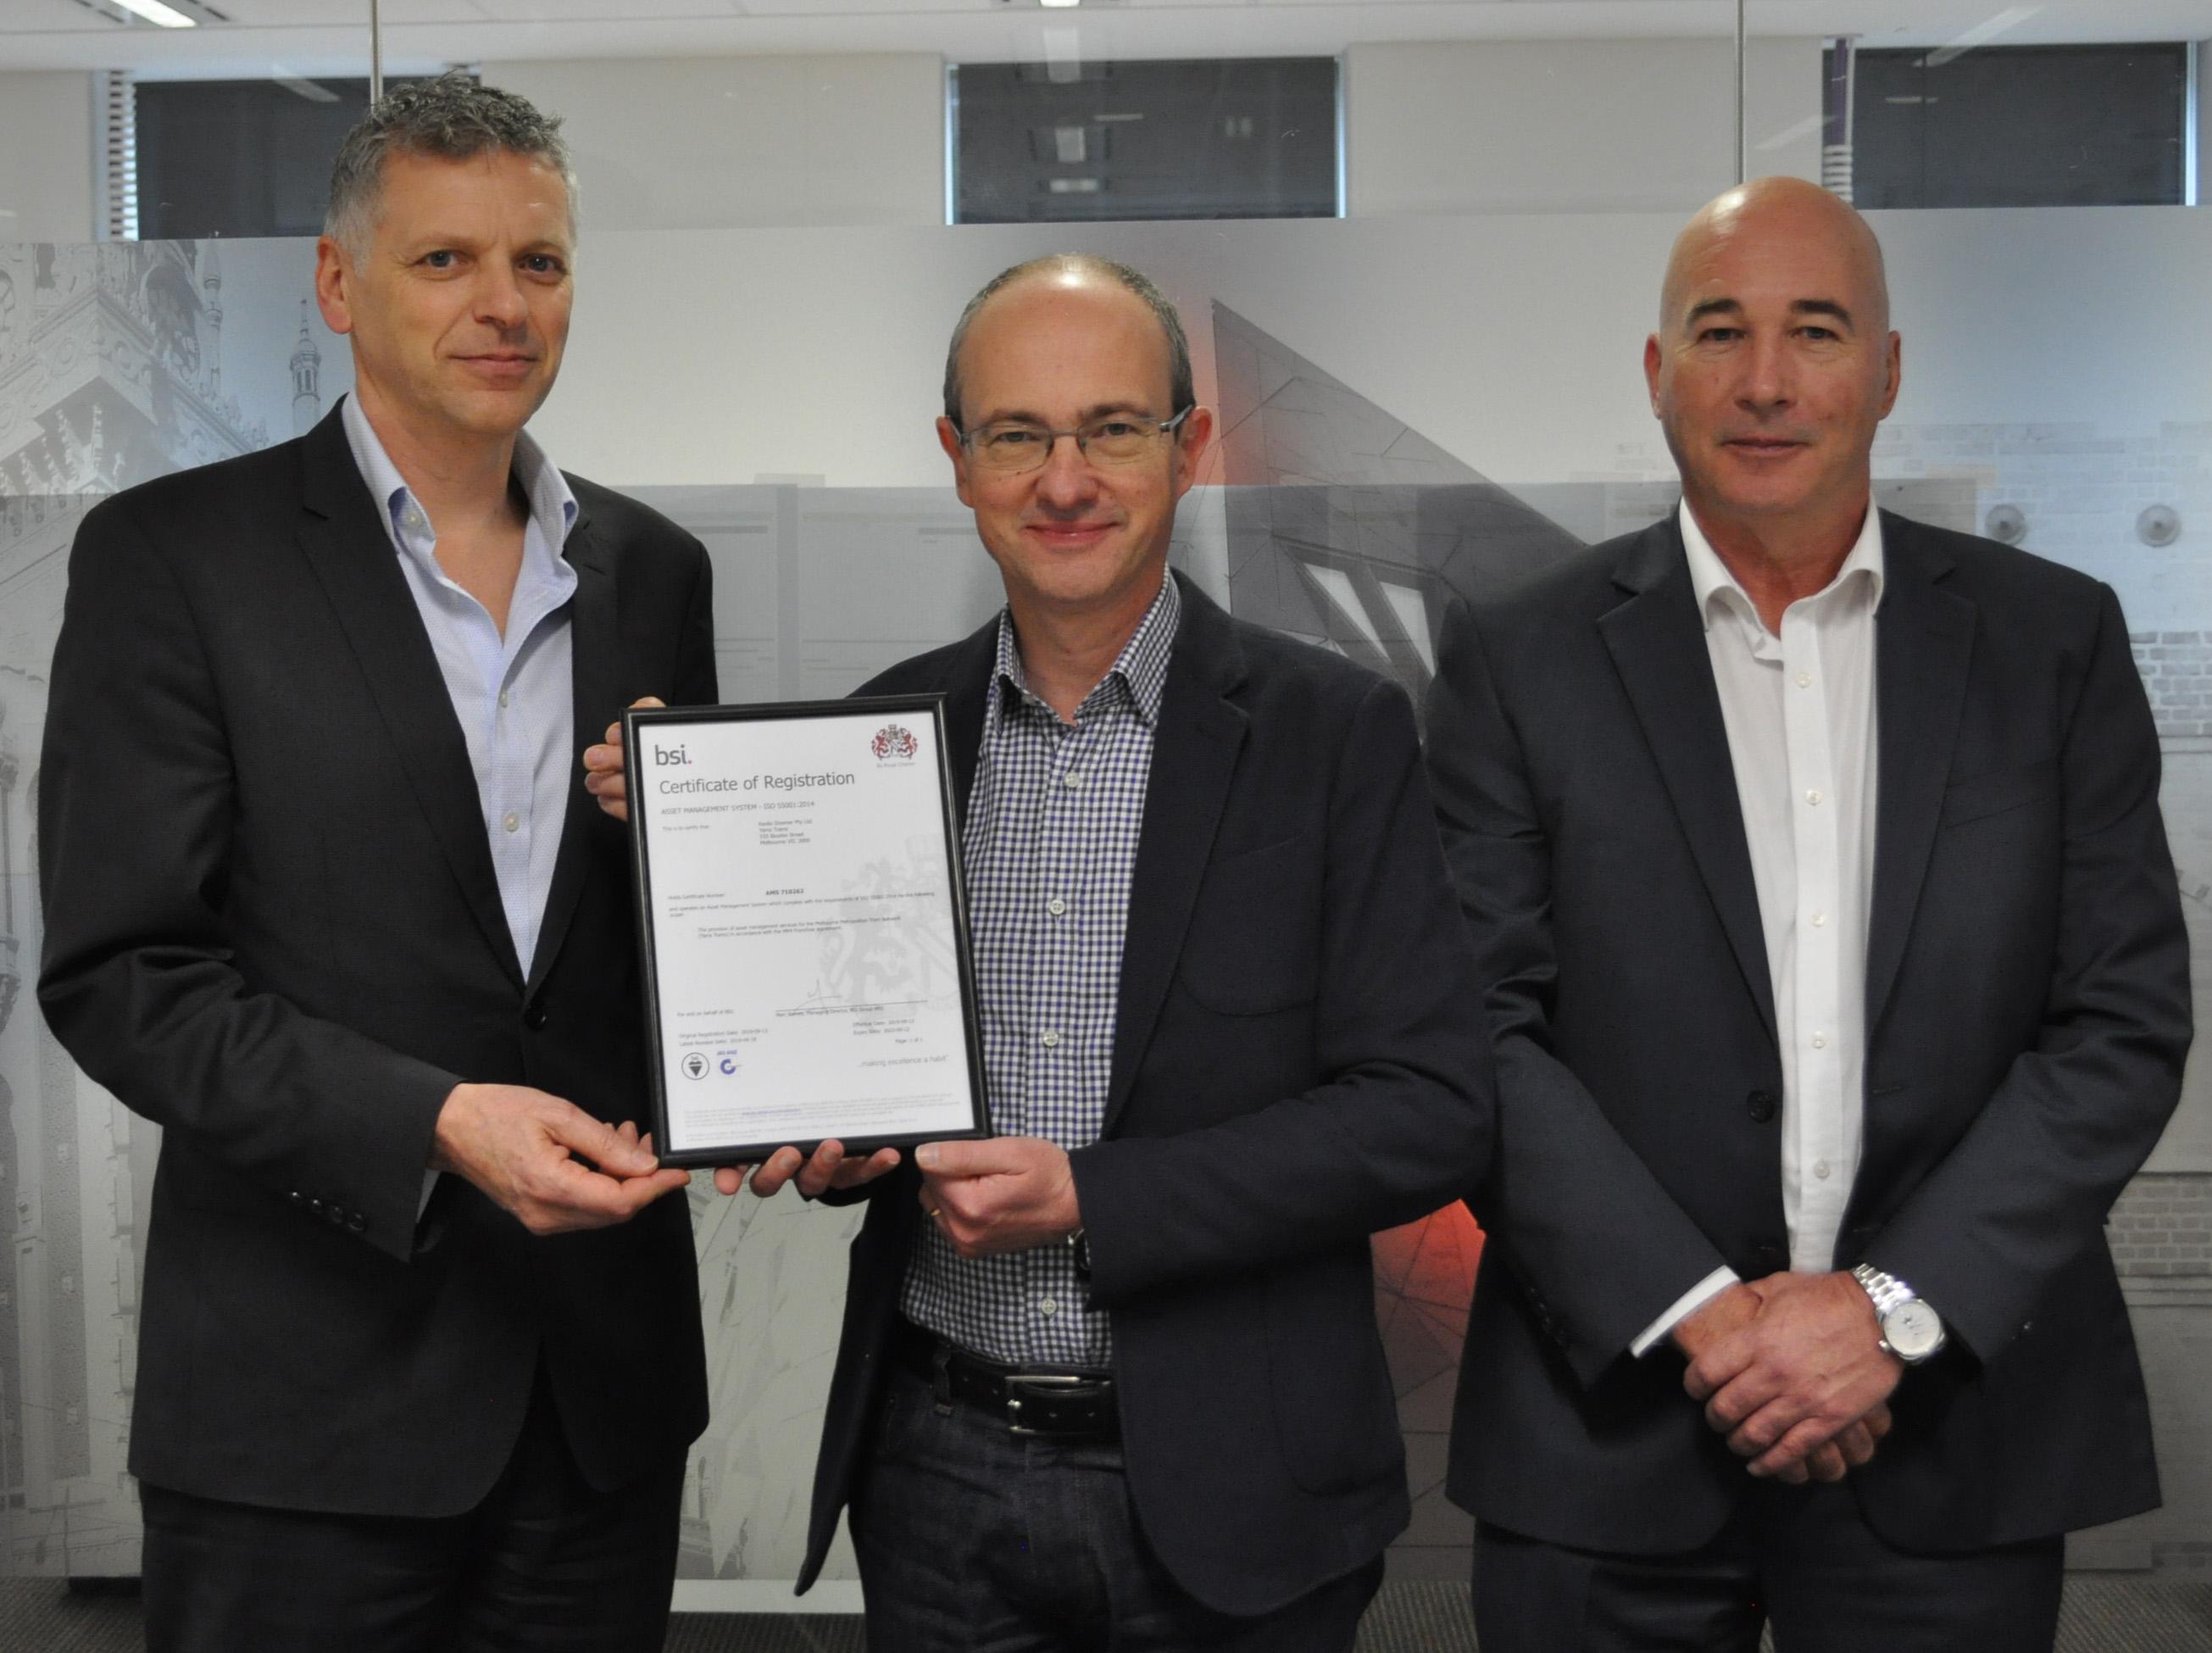 Yarra Trams achieves landmark accreditation in Asset Management